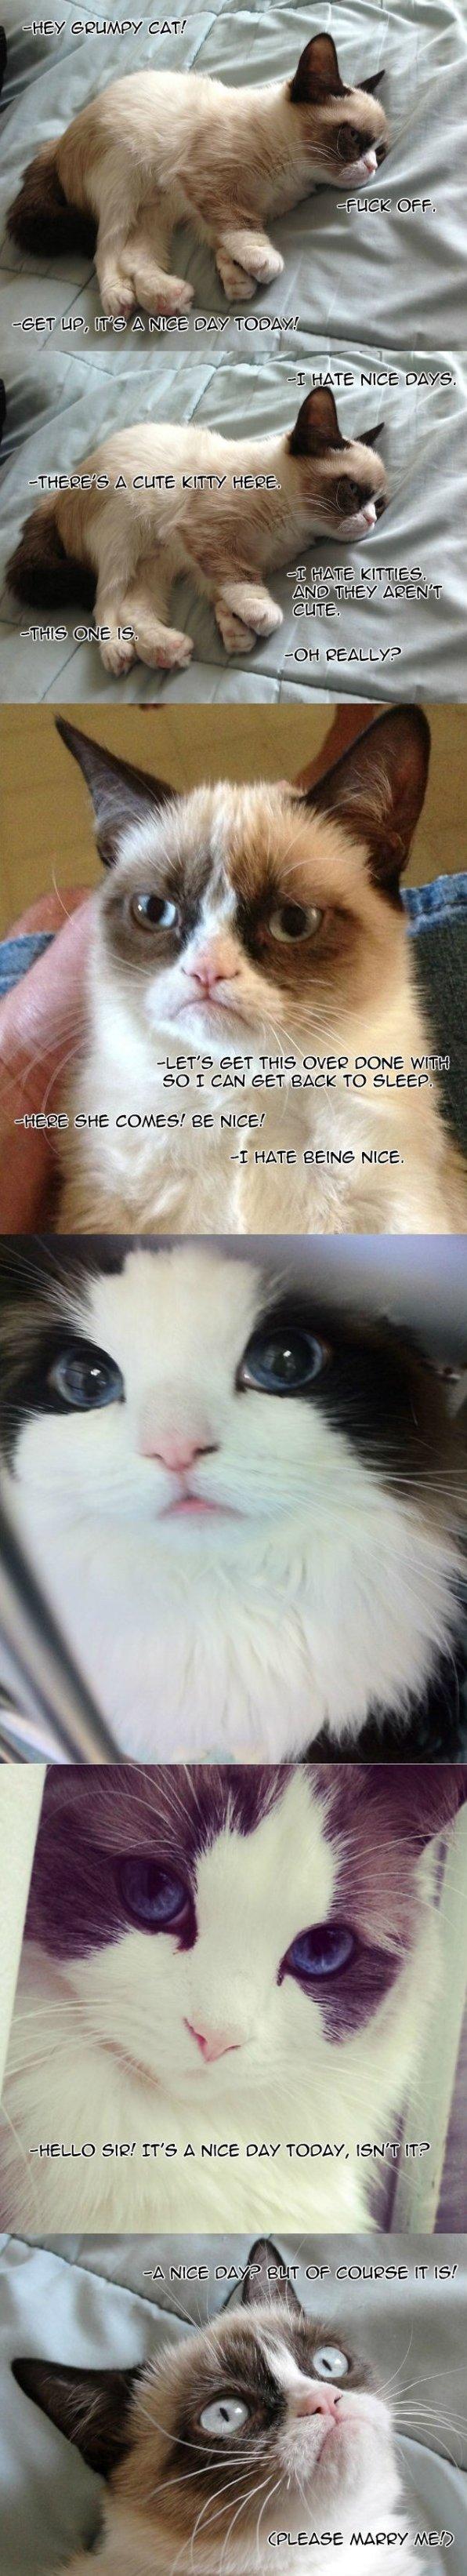 Even Grumpy Cat Is Charmed